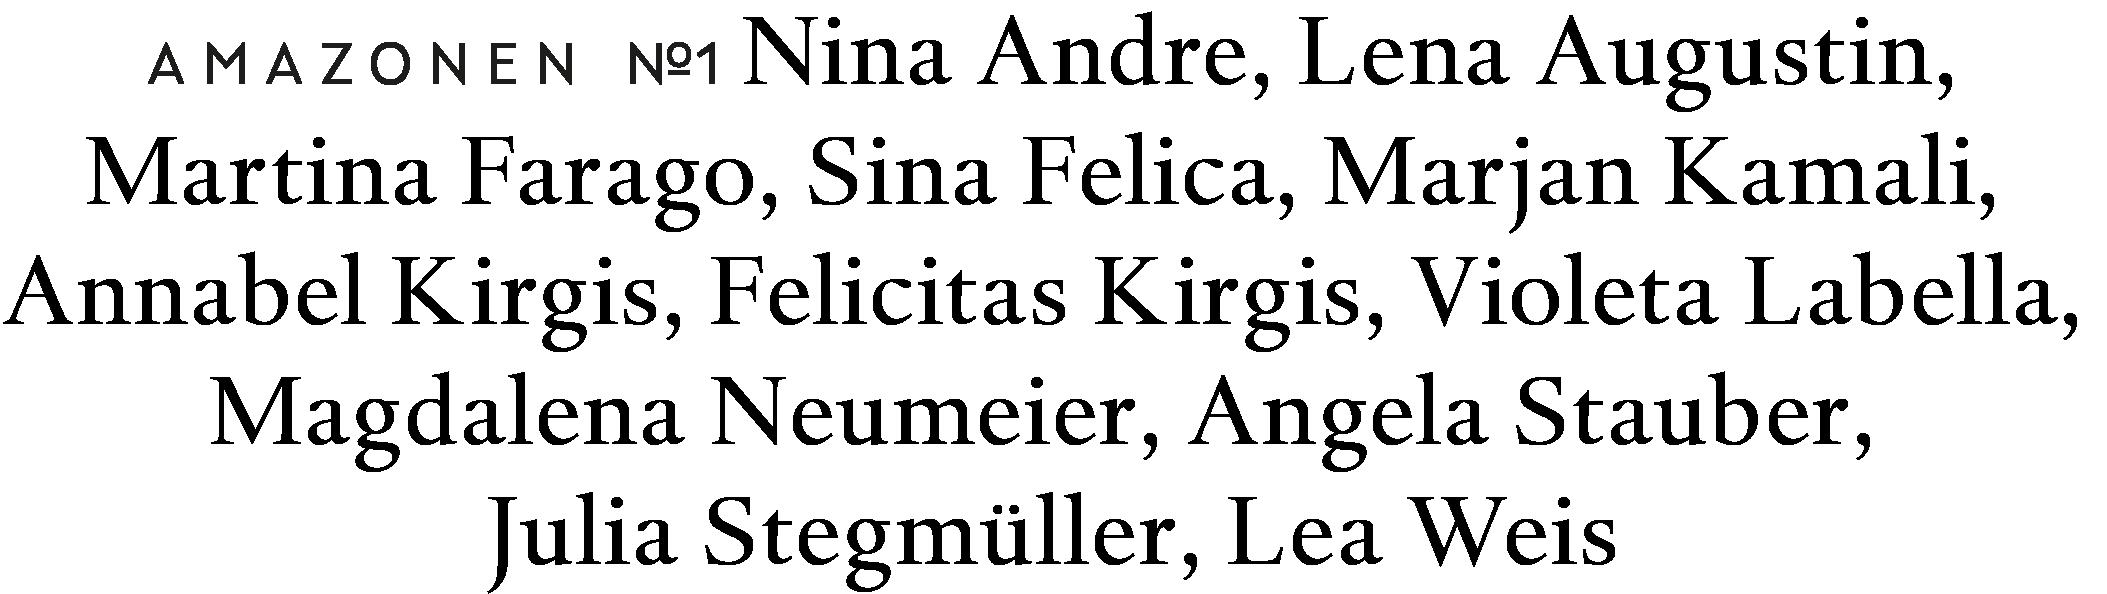 amazonenmagazin-amazonen-groesser-aufzahelung